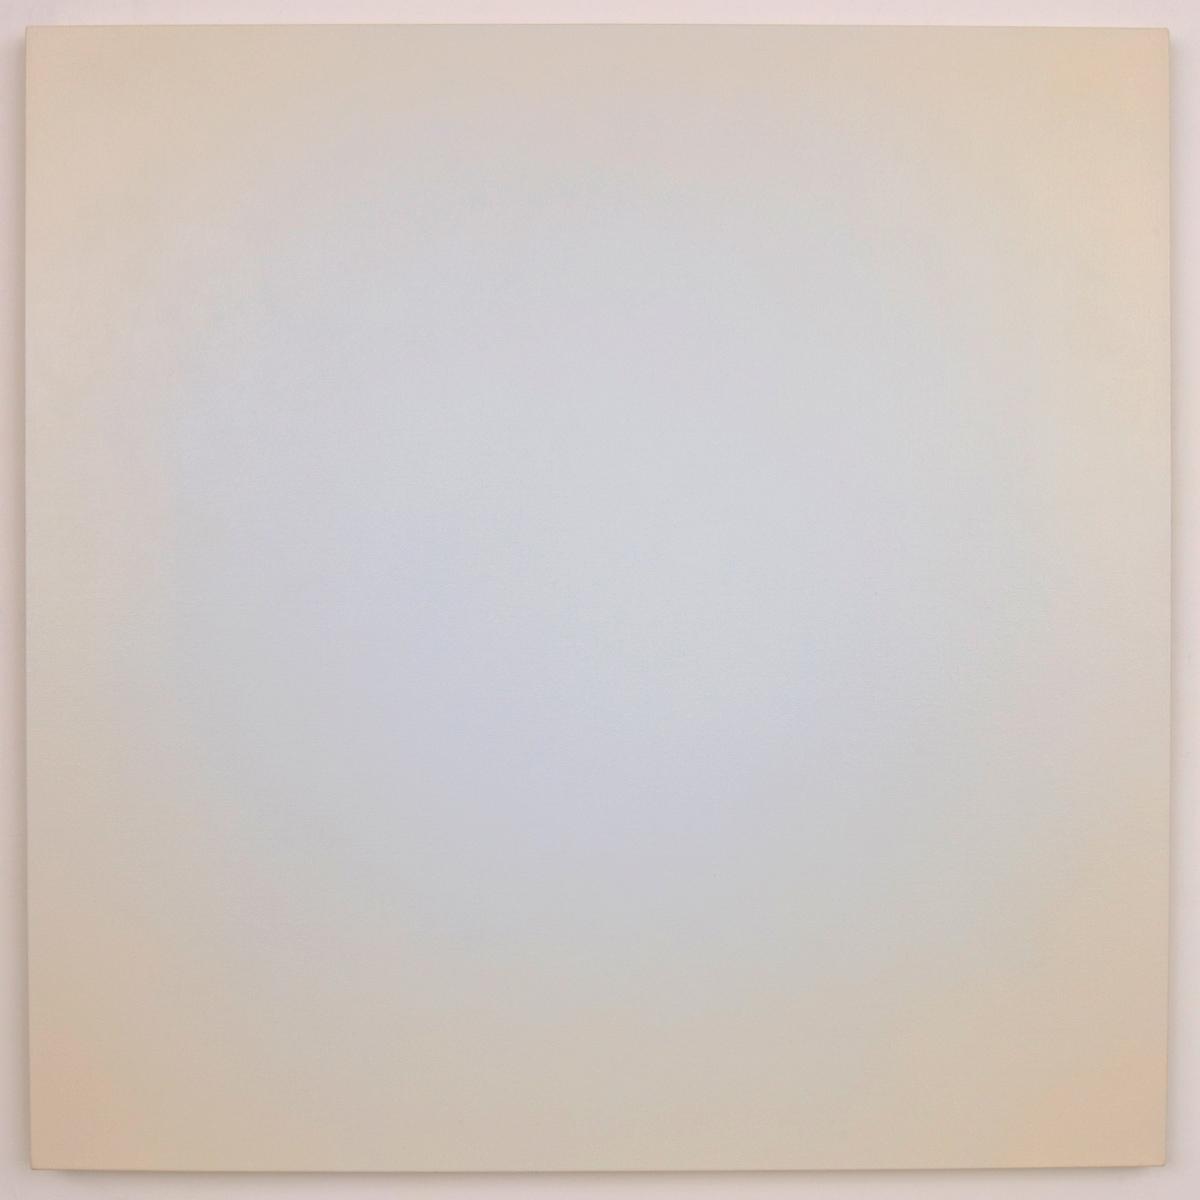 Blue Orange #12 (White/Red-Orange), Equivalence Blue Orange Series, 2006, oil on canvas, 30 x 30 in. (76 x 76 cm.)